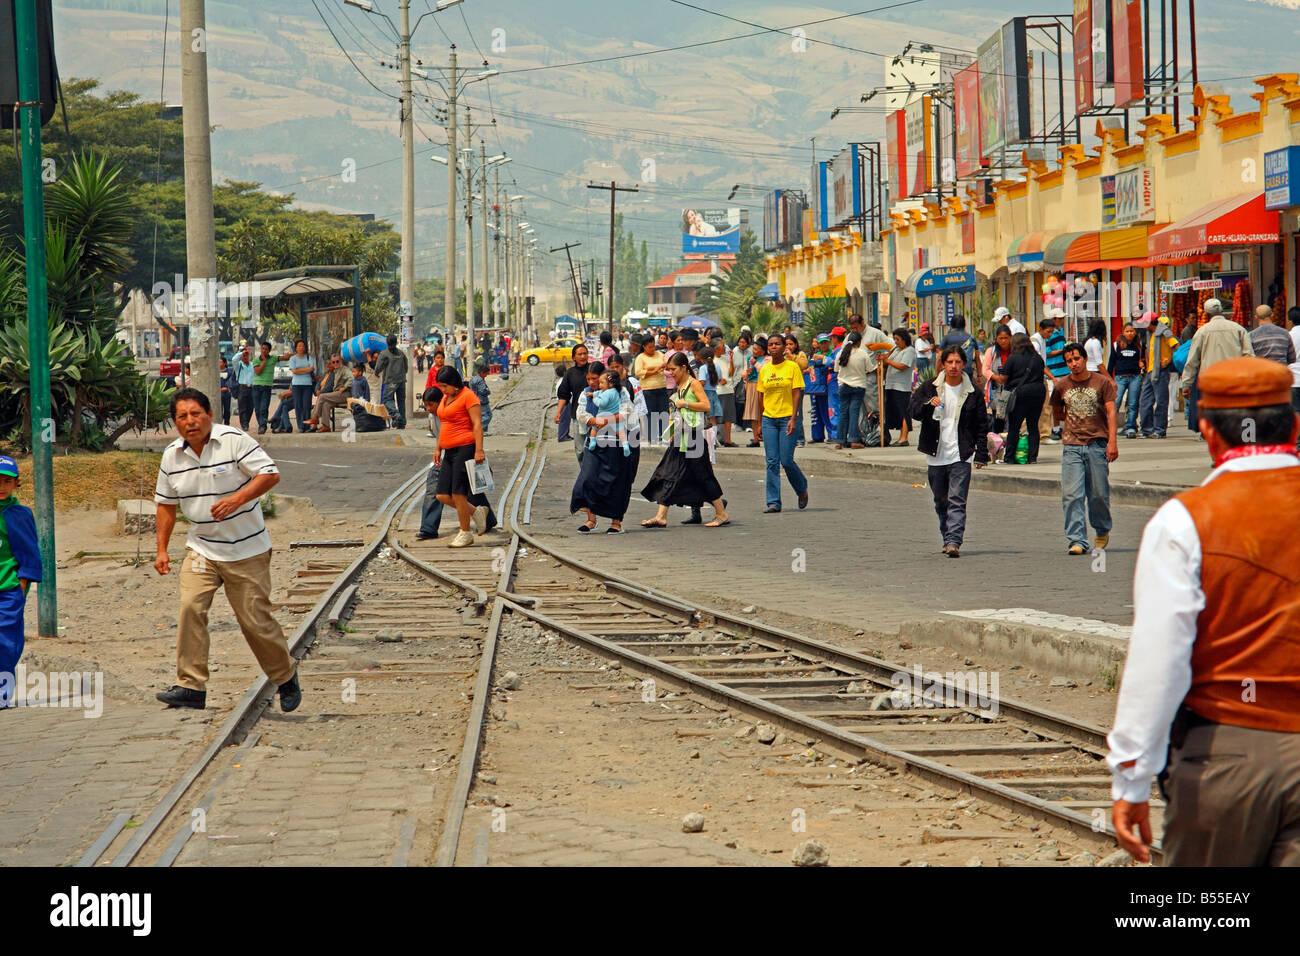 Veiw from the Chaski Antawa (Messenger Train), city of Ibarra, Ecuador - looking towards Imbabura volcano - Stock Image